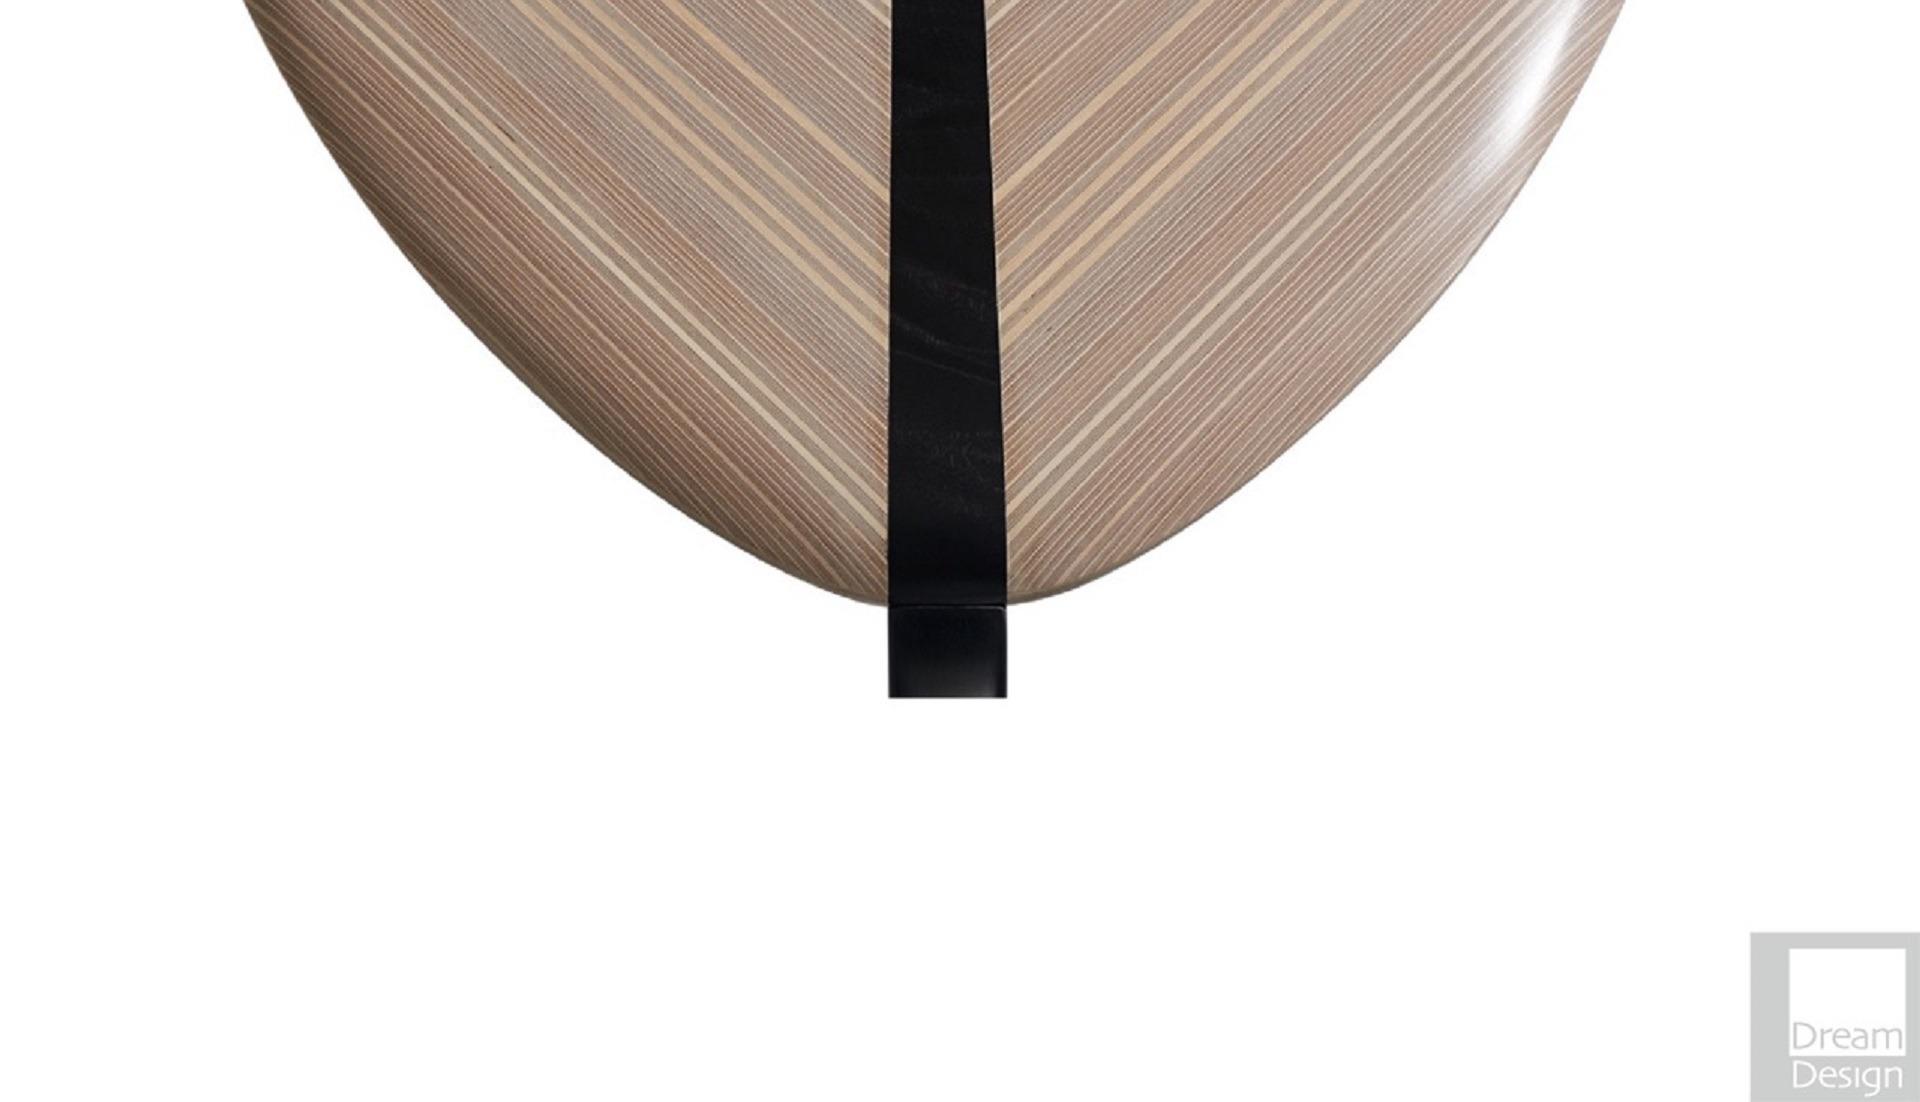 Poltrona frau bird coffee table dream design interiors ltd - Poltrona design low cost ...